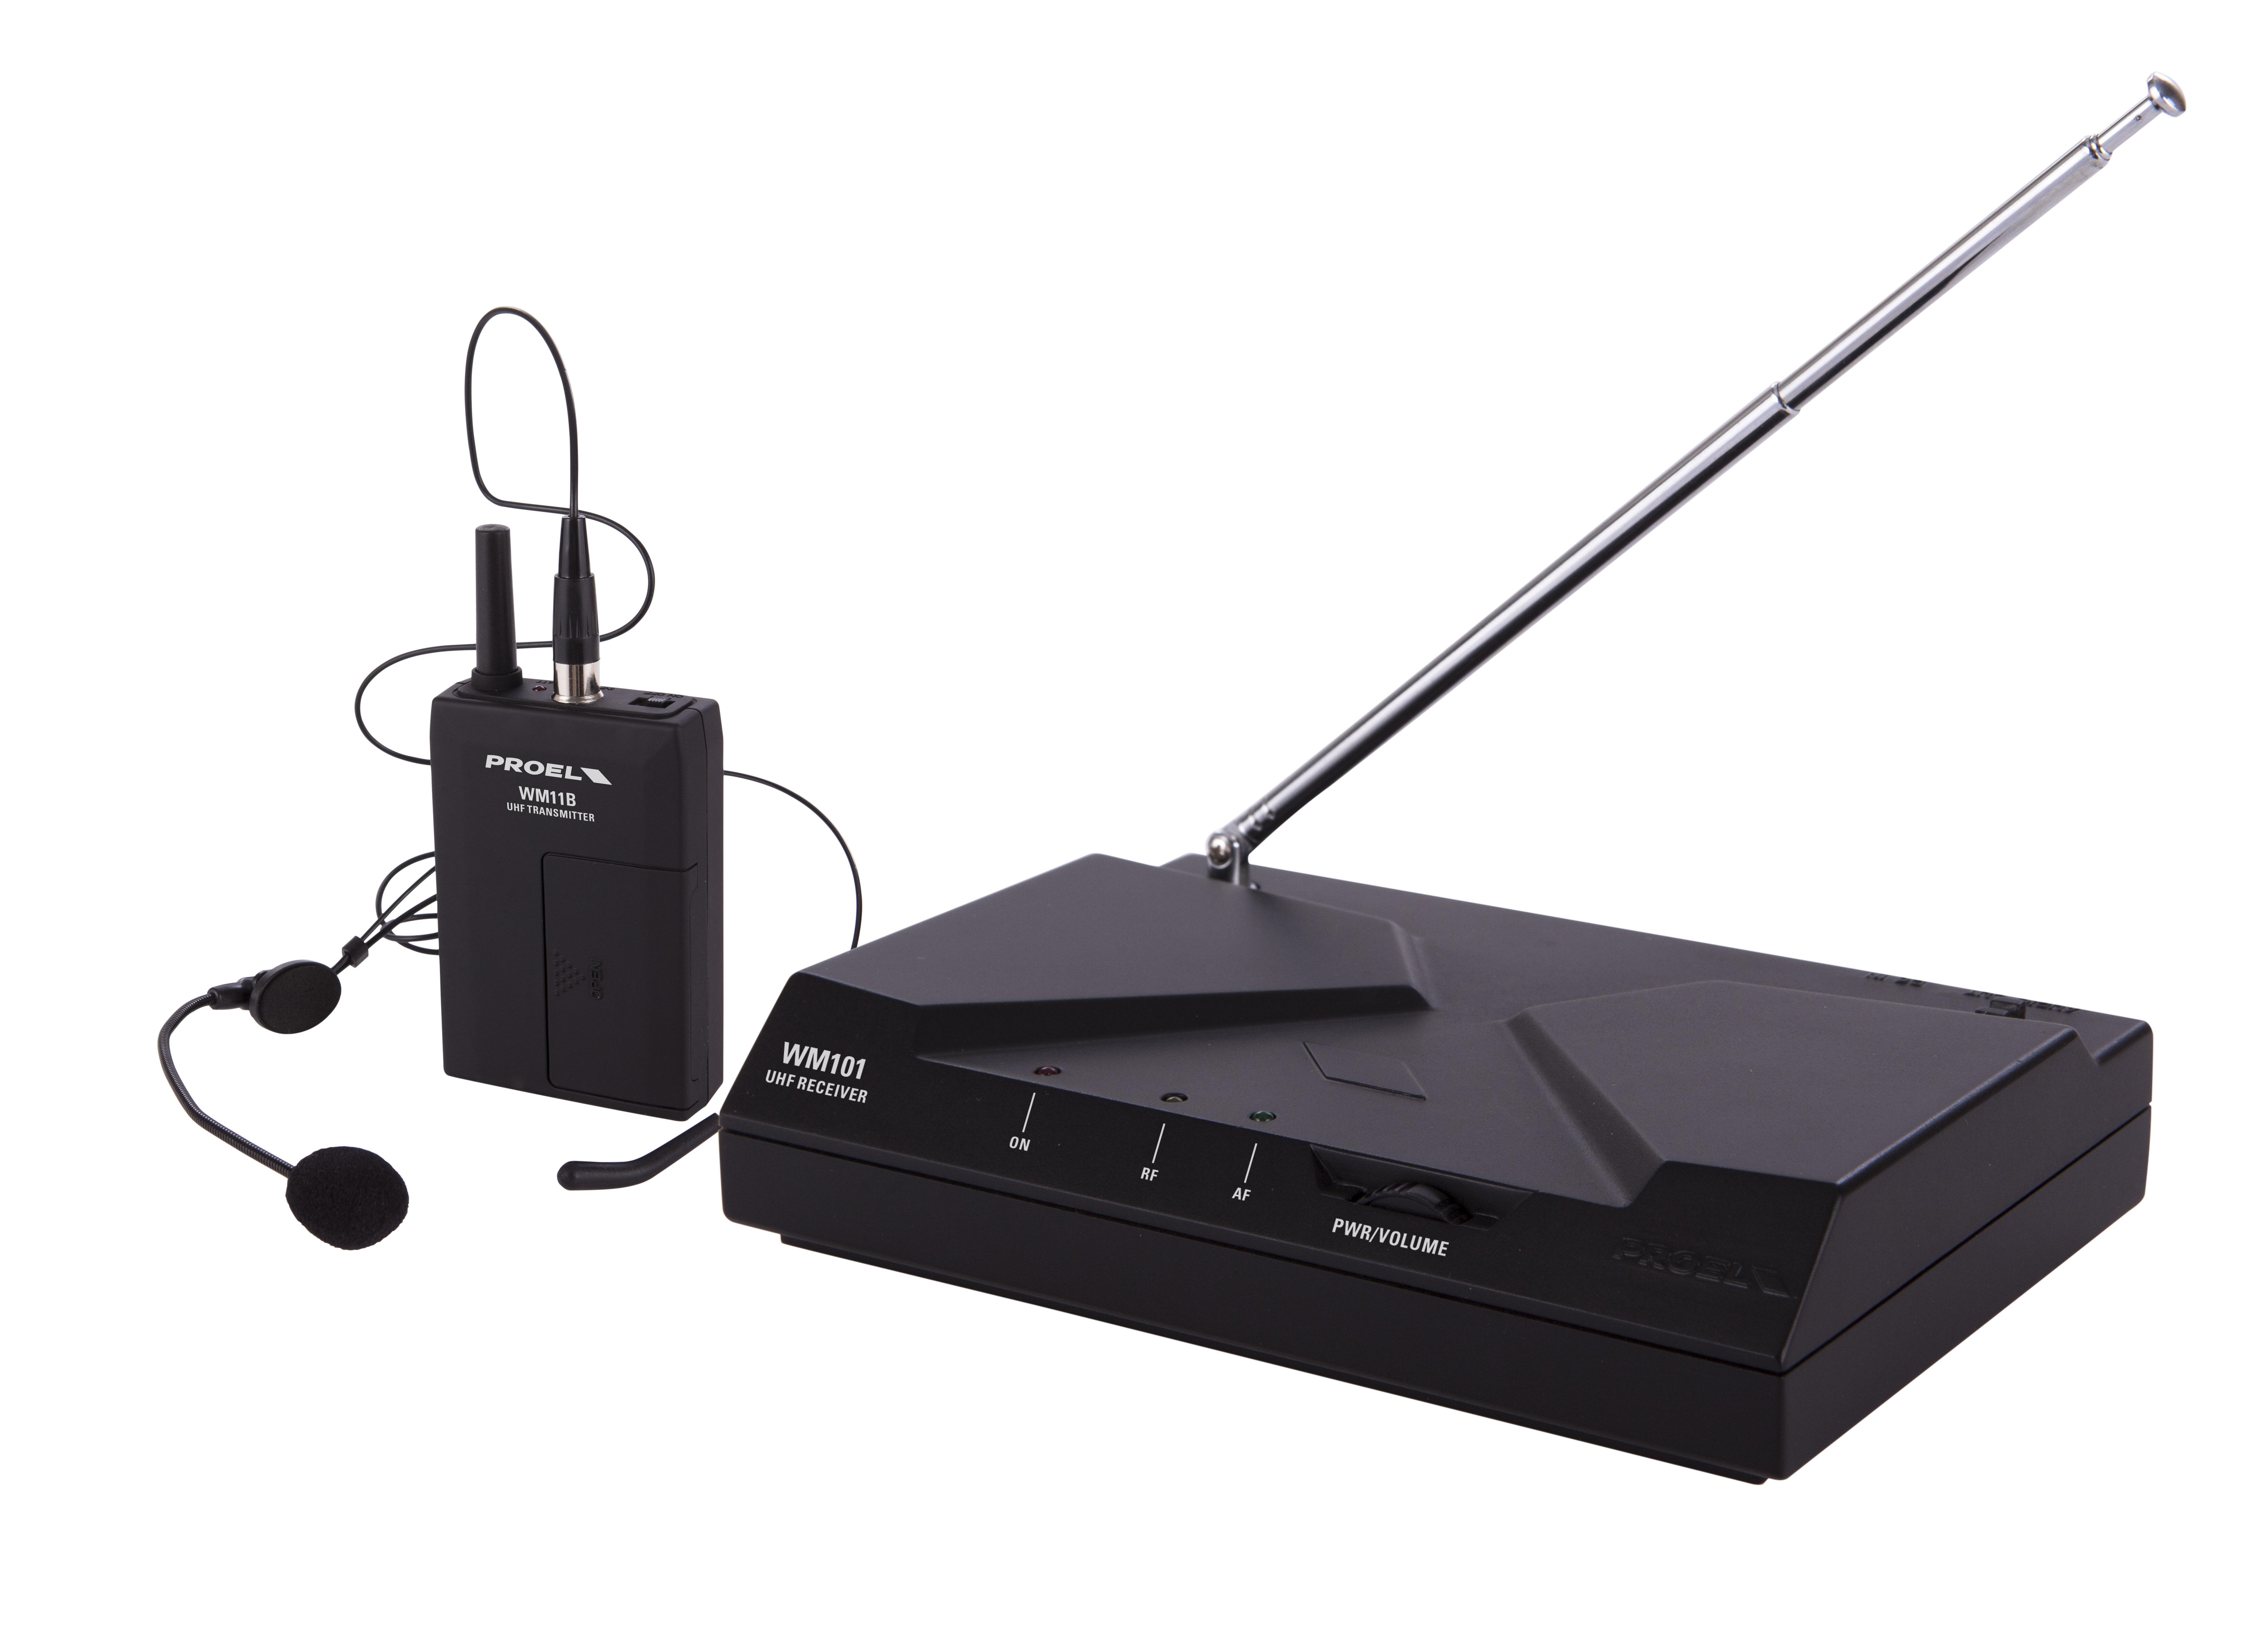 PROEL WM101H - UHF Wireless Microphone